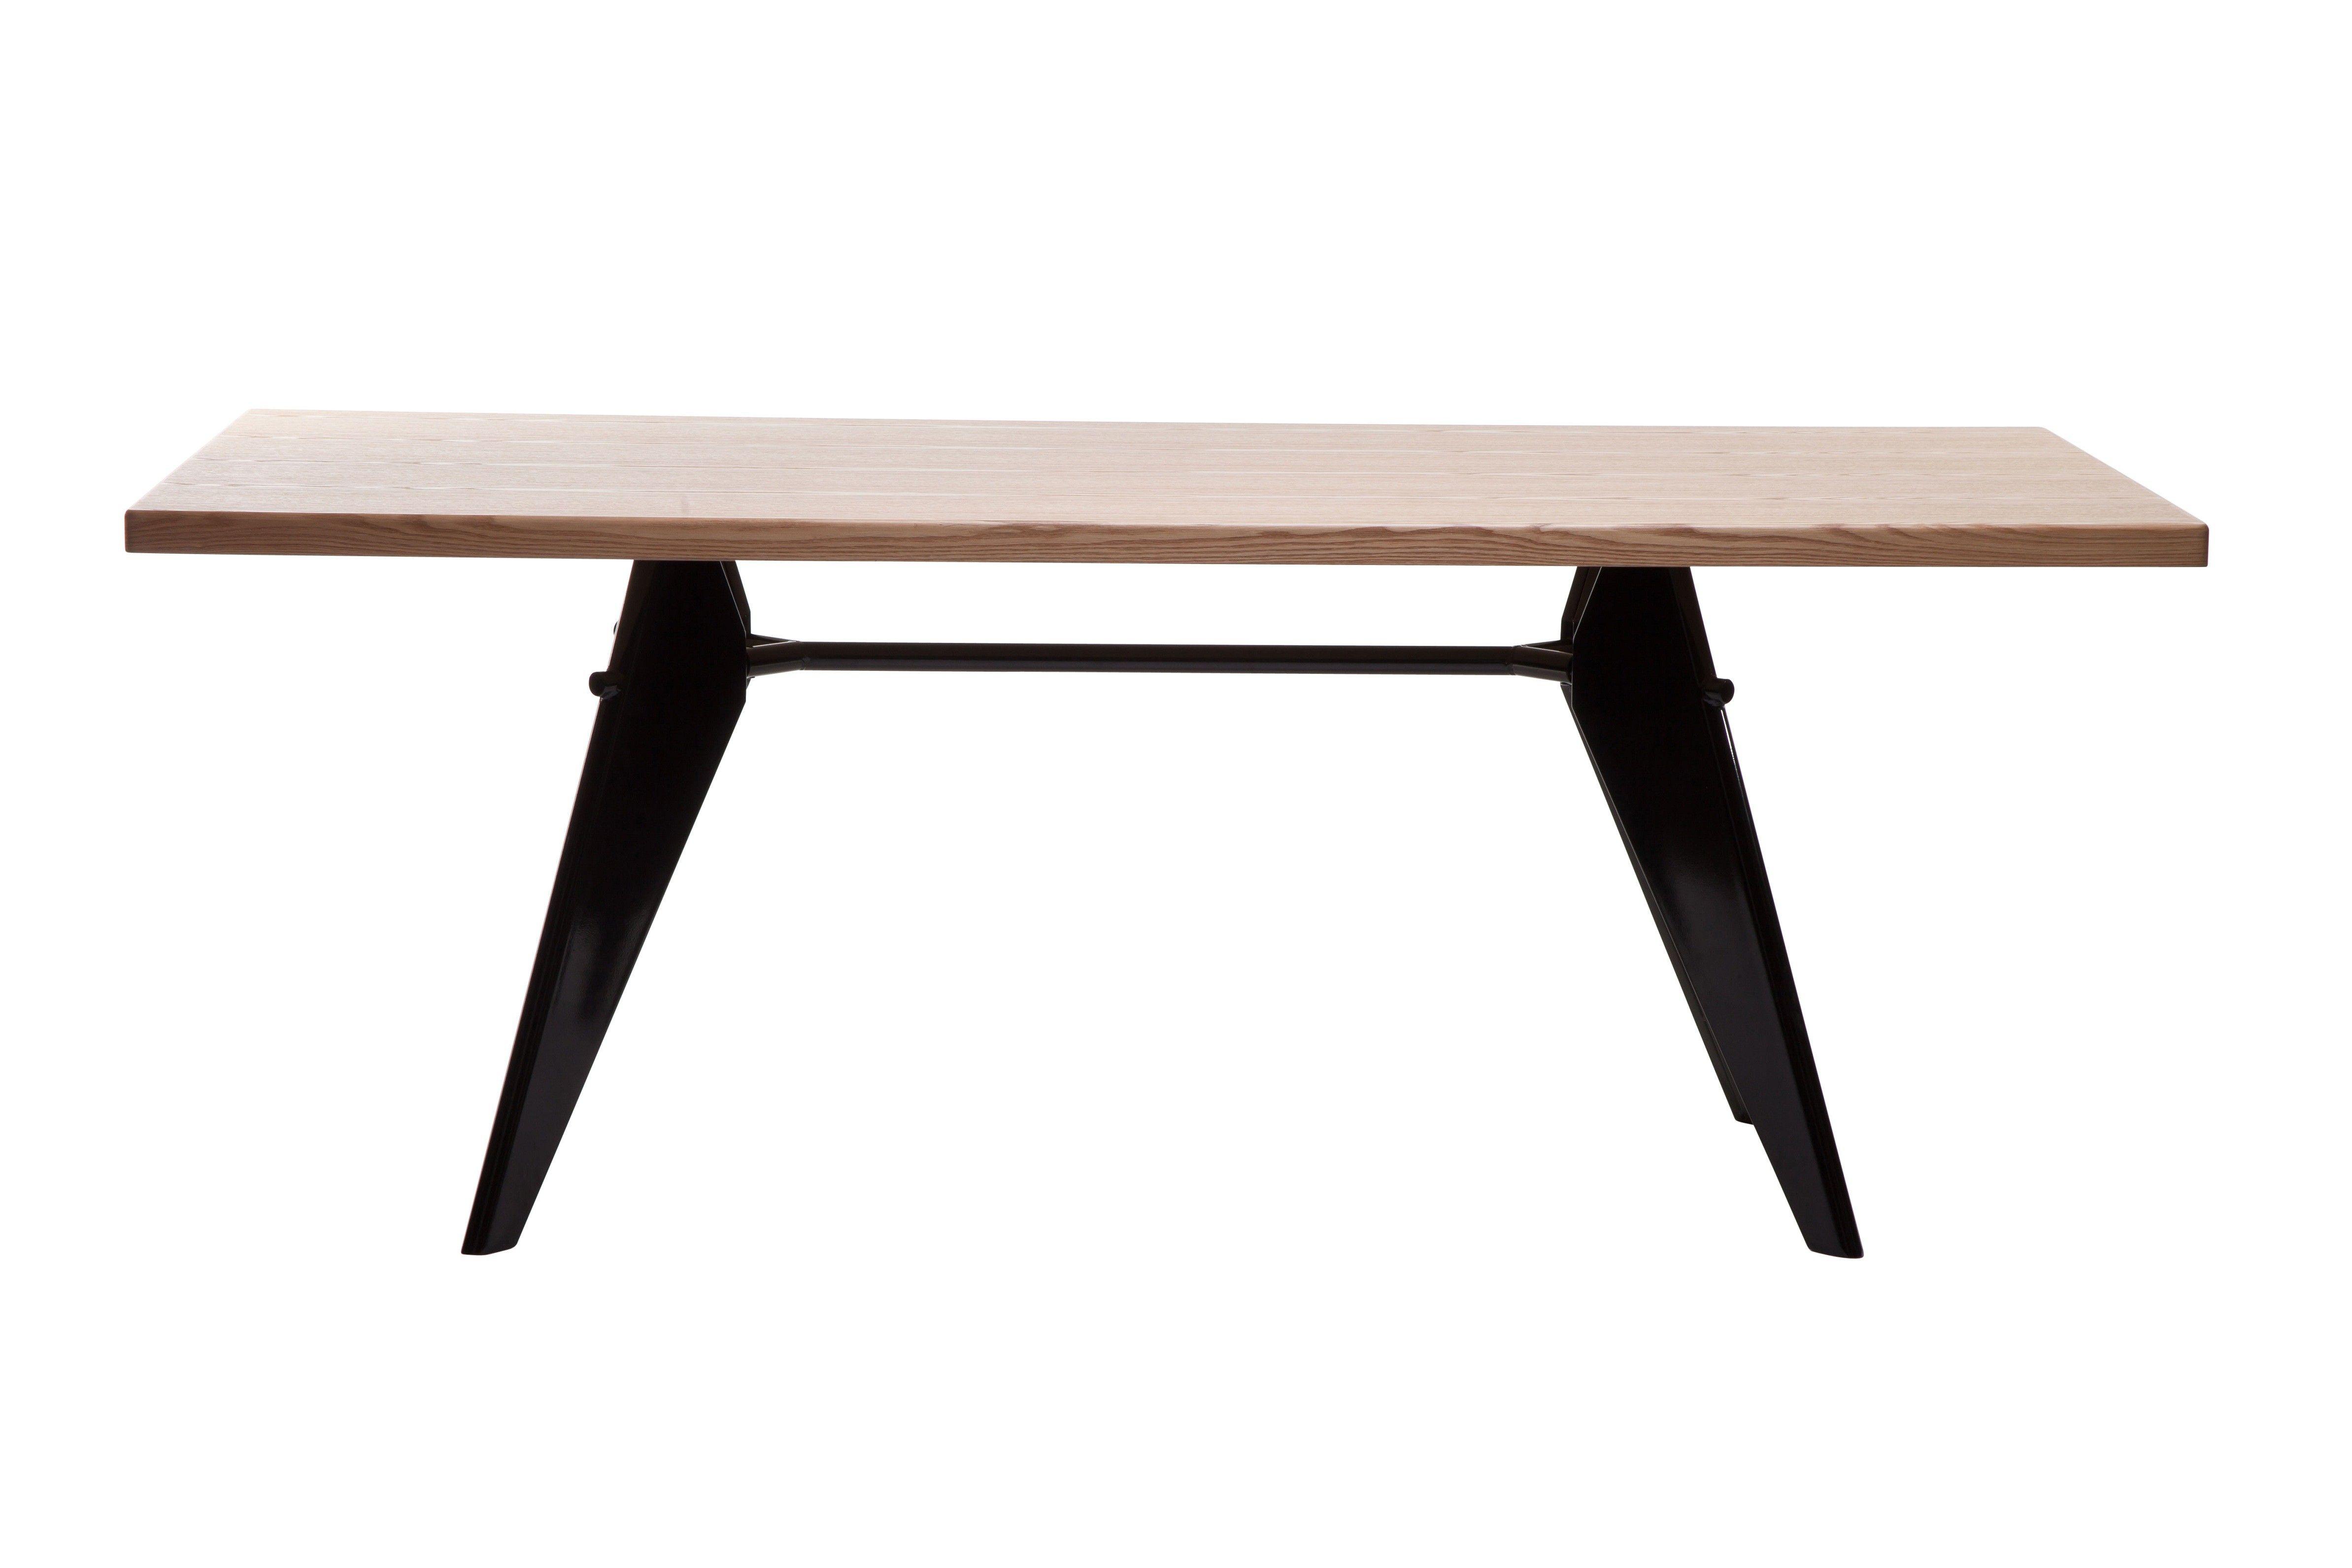 Replica Jean Prouve Em Rectangle Dining Table Oak The Em